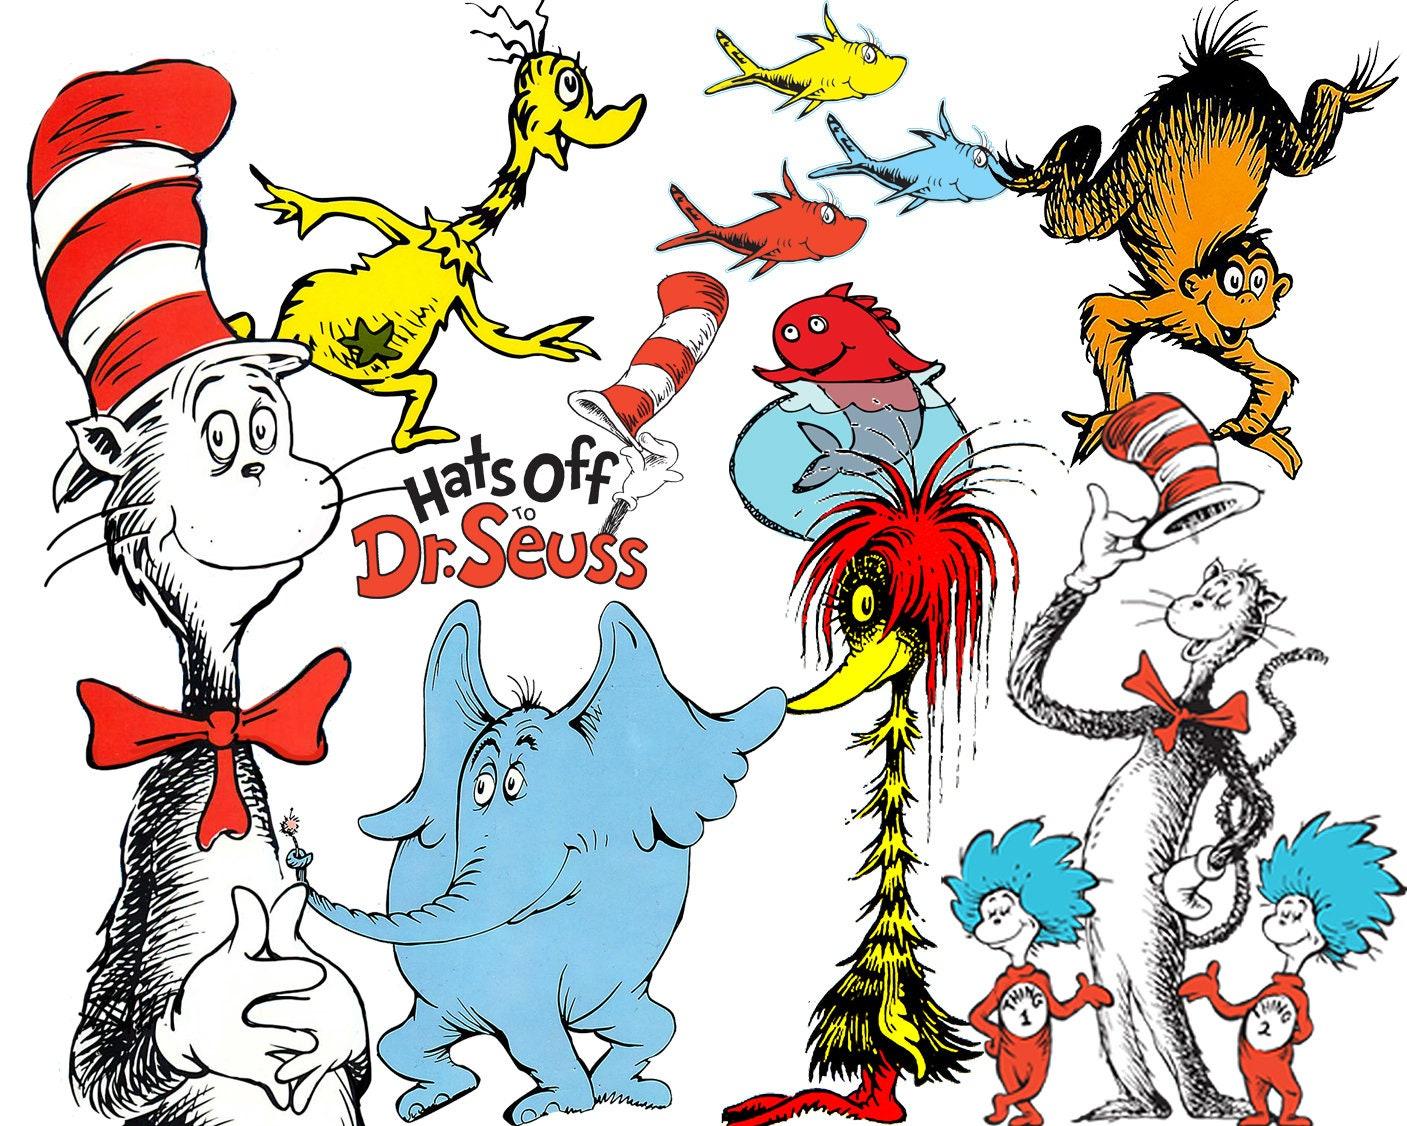 Dr Seuss Clip Art Green Eggs And Ham | Clipart library - Free  |Dr Seuss Clip Art